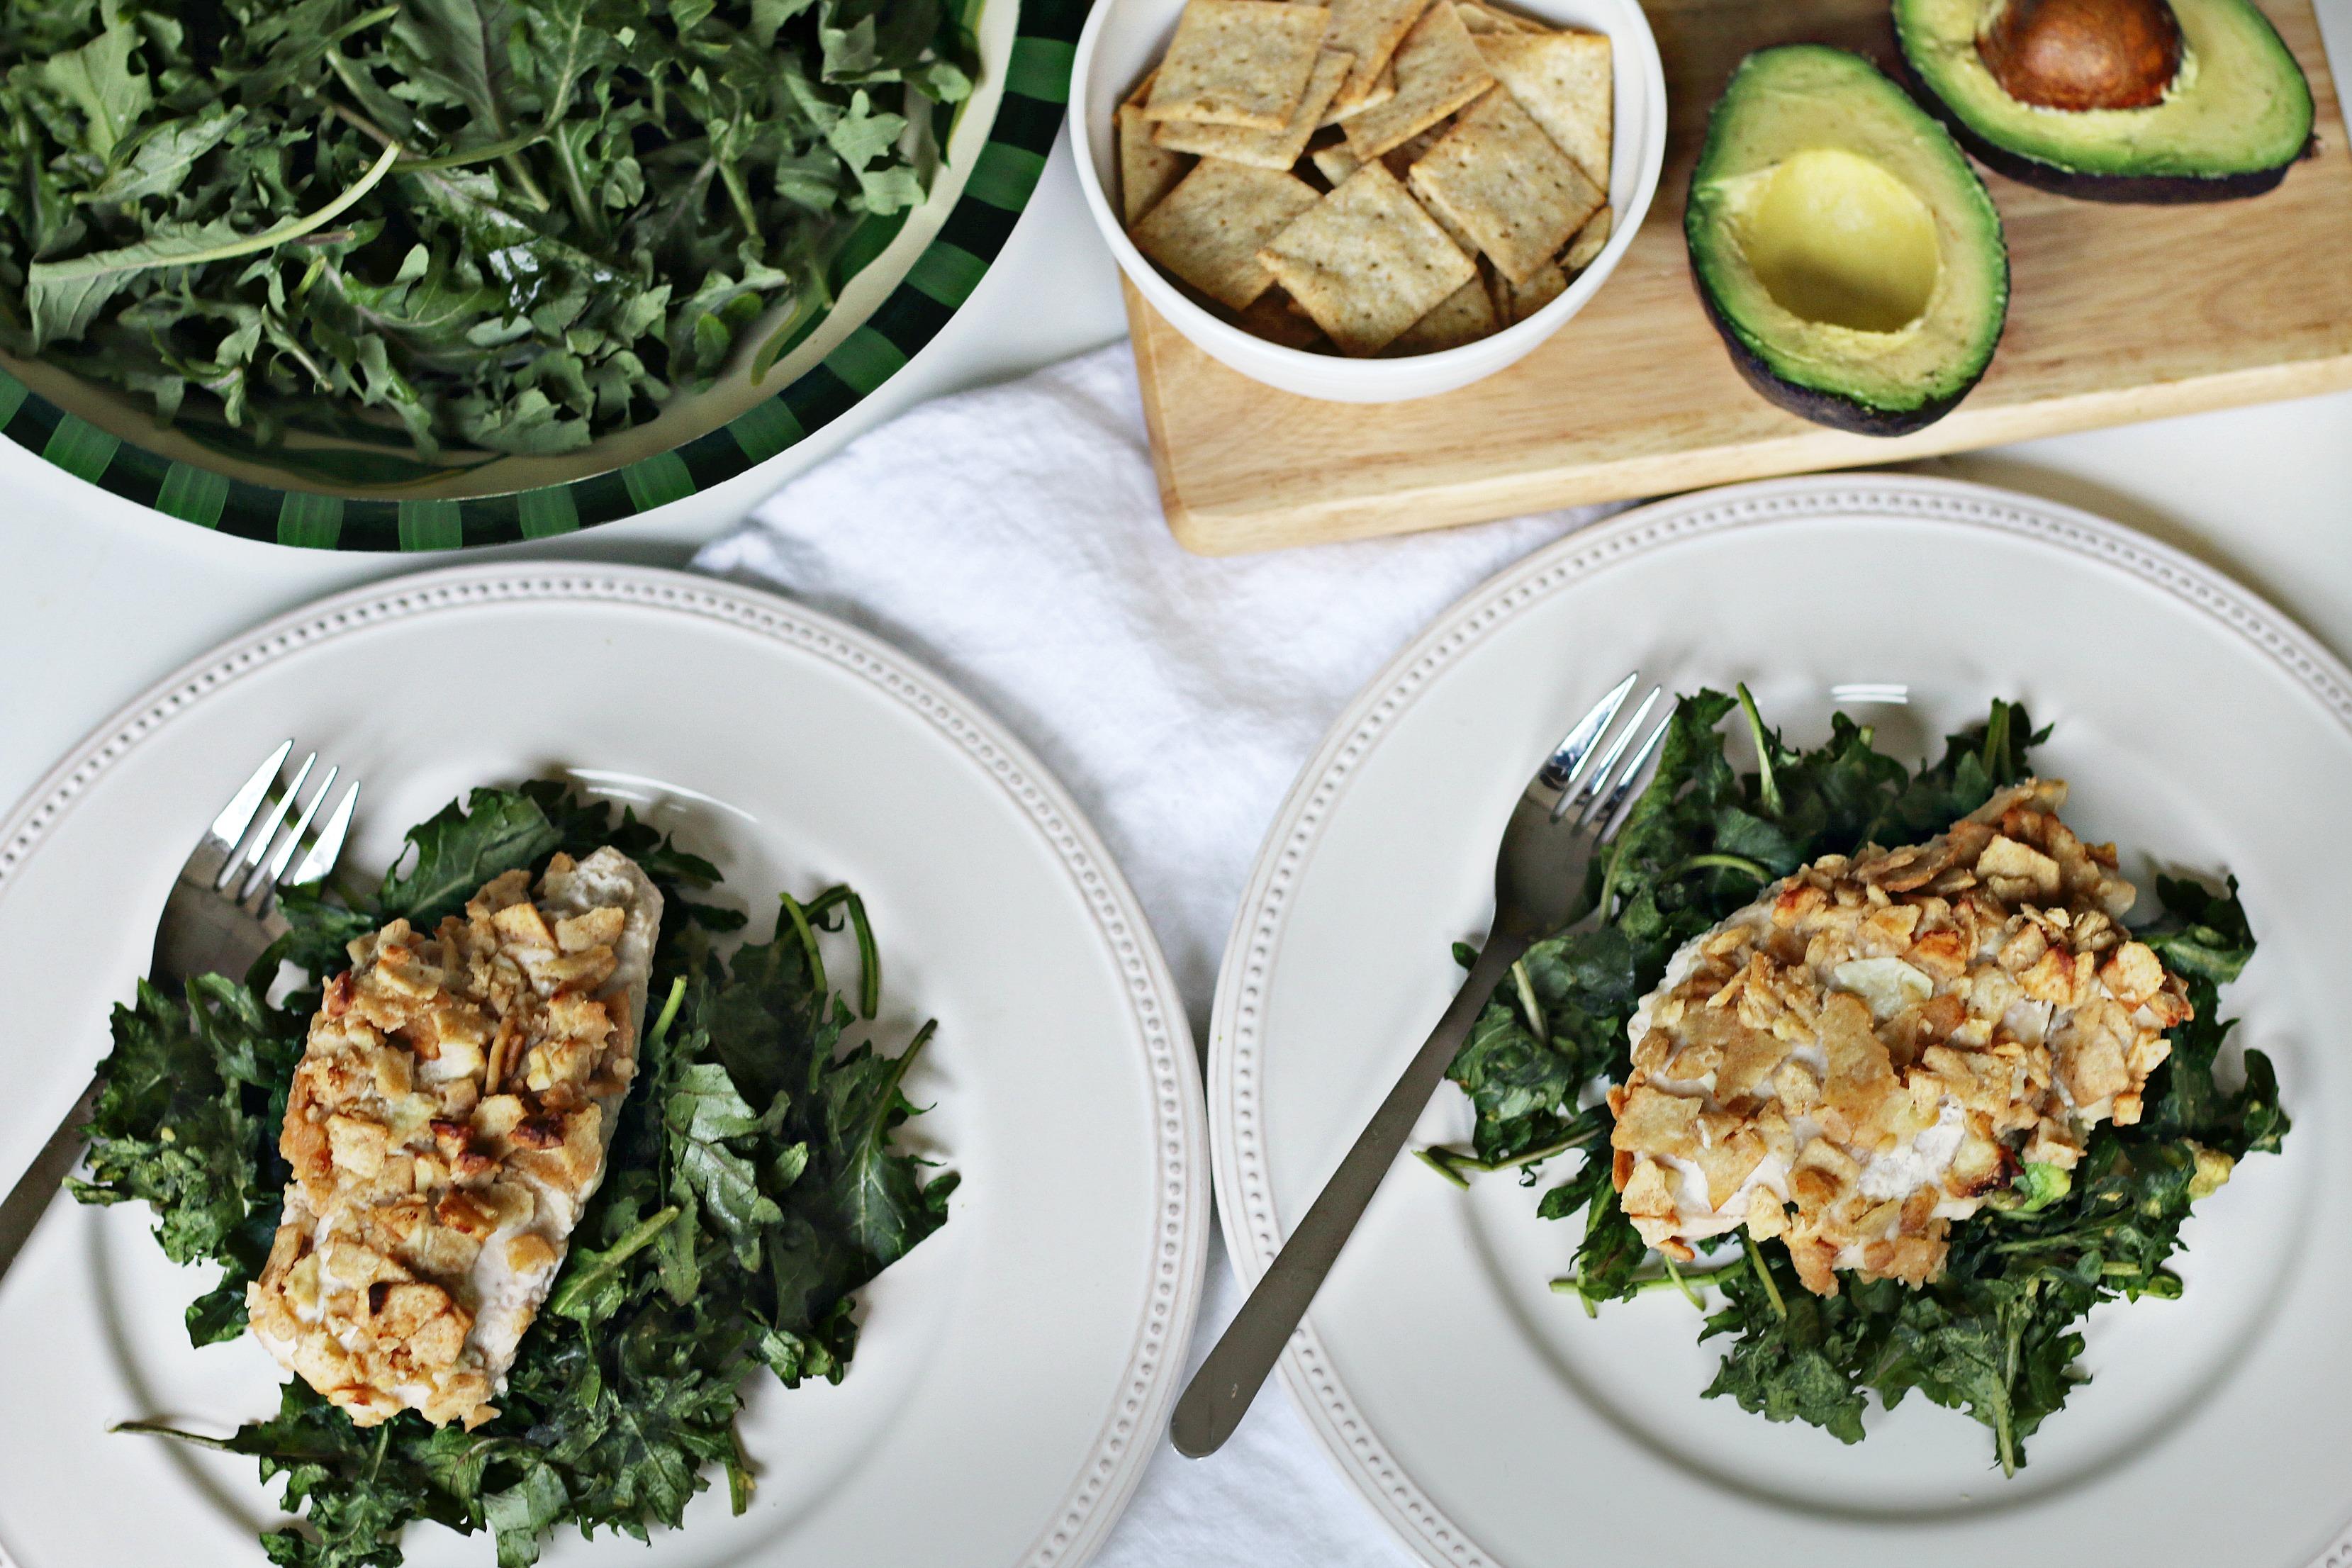 Garlic Crusted Chicken-N-Kale